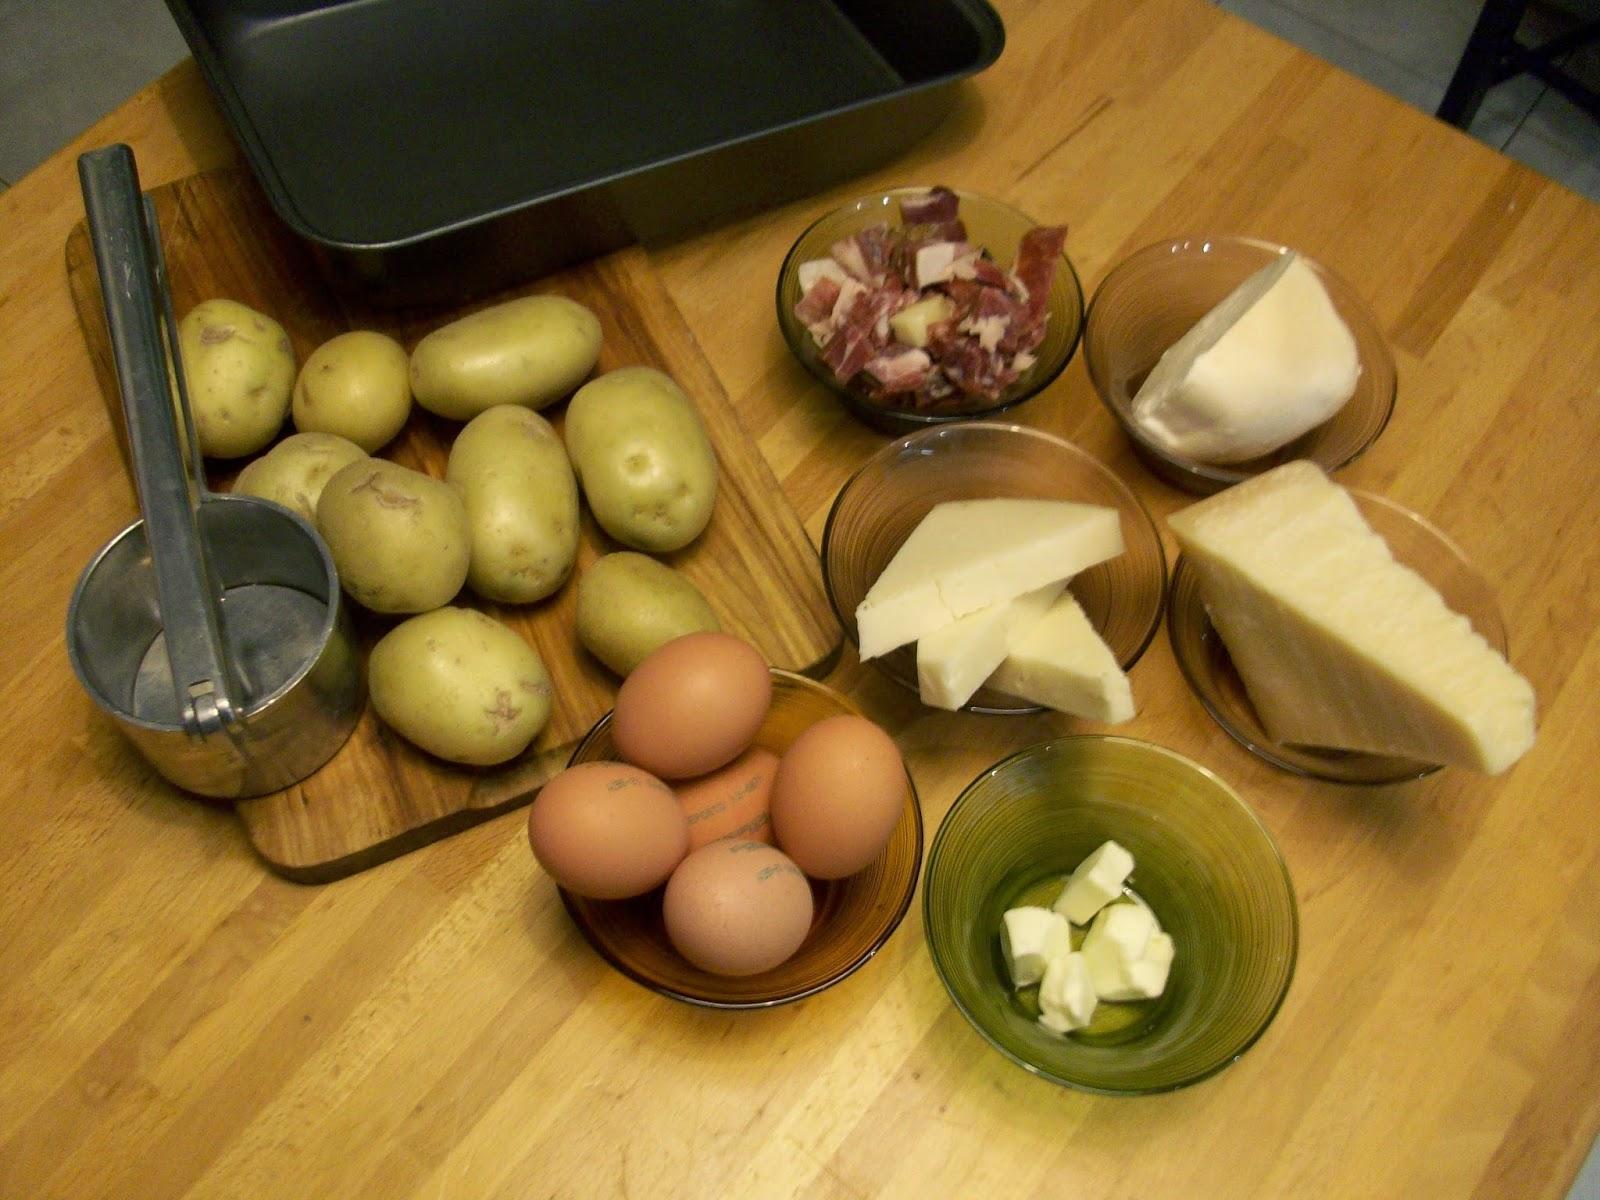 LA CUCINA NAPOLETANA DI SILVY Gateau di patate